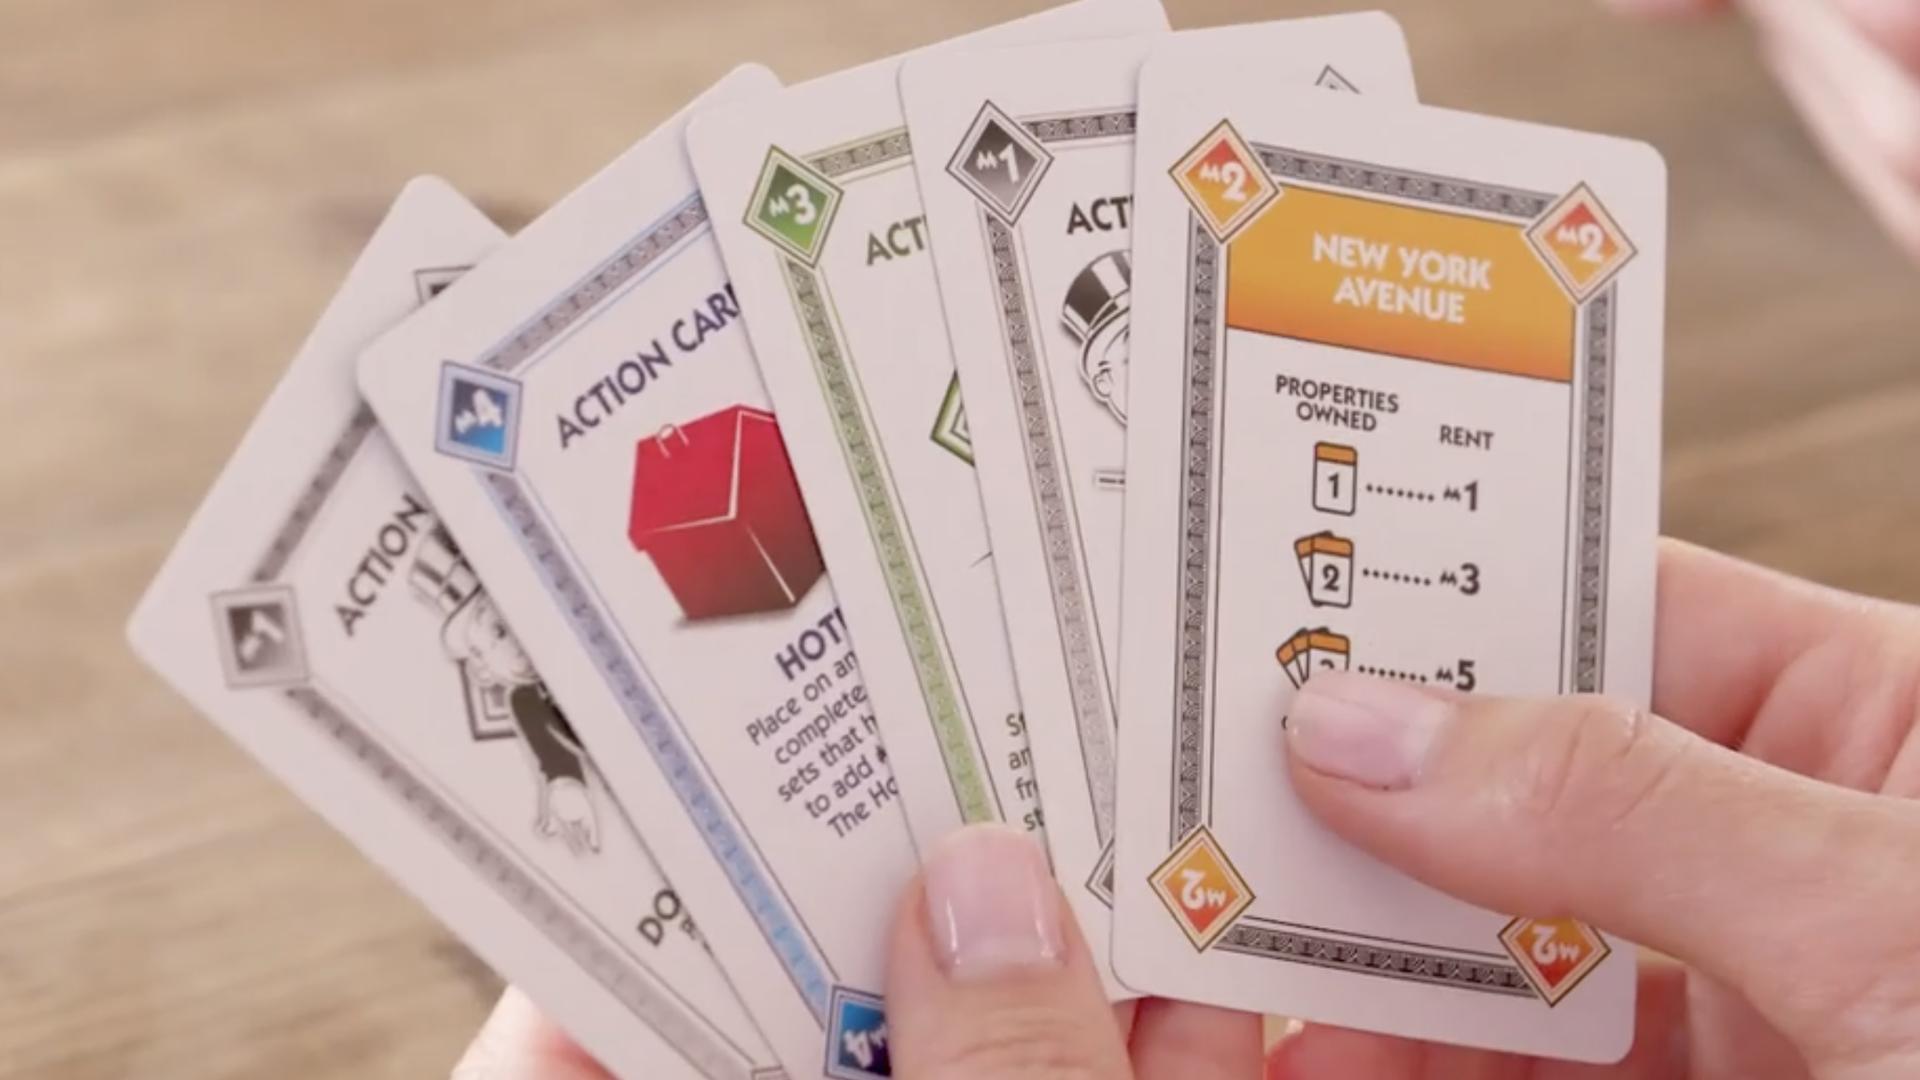 Monopoly Deal cards held in hands